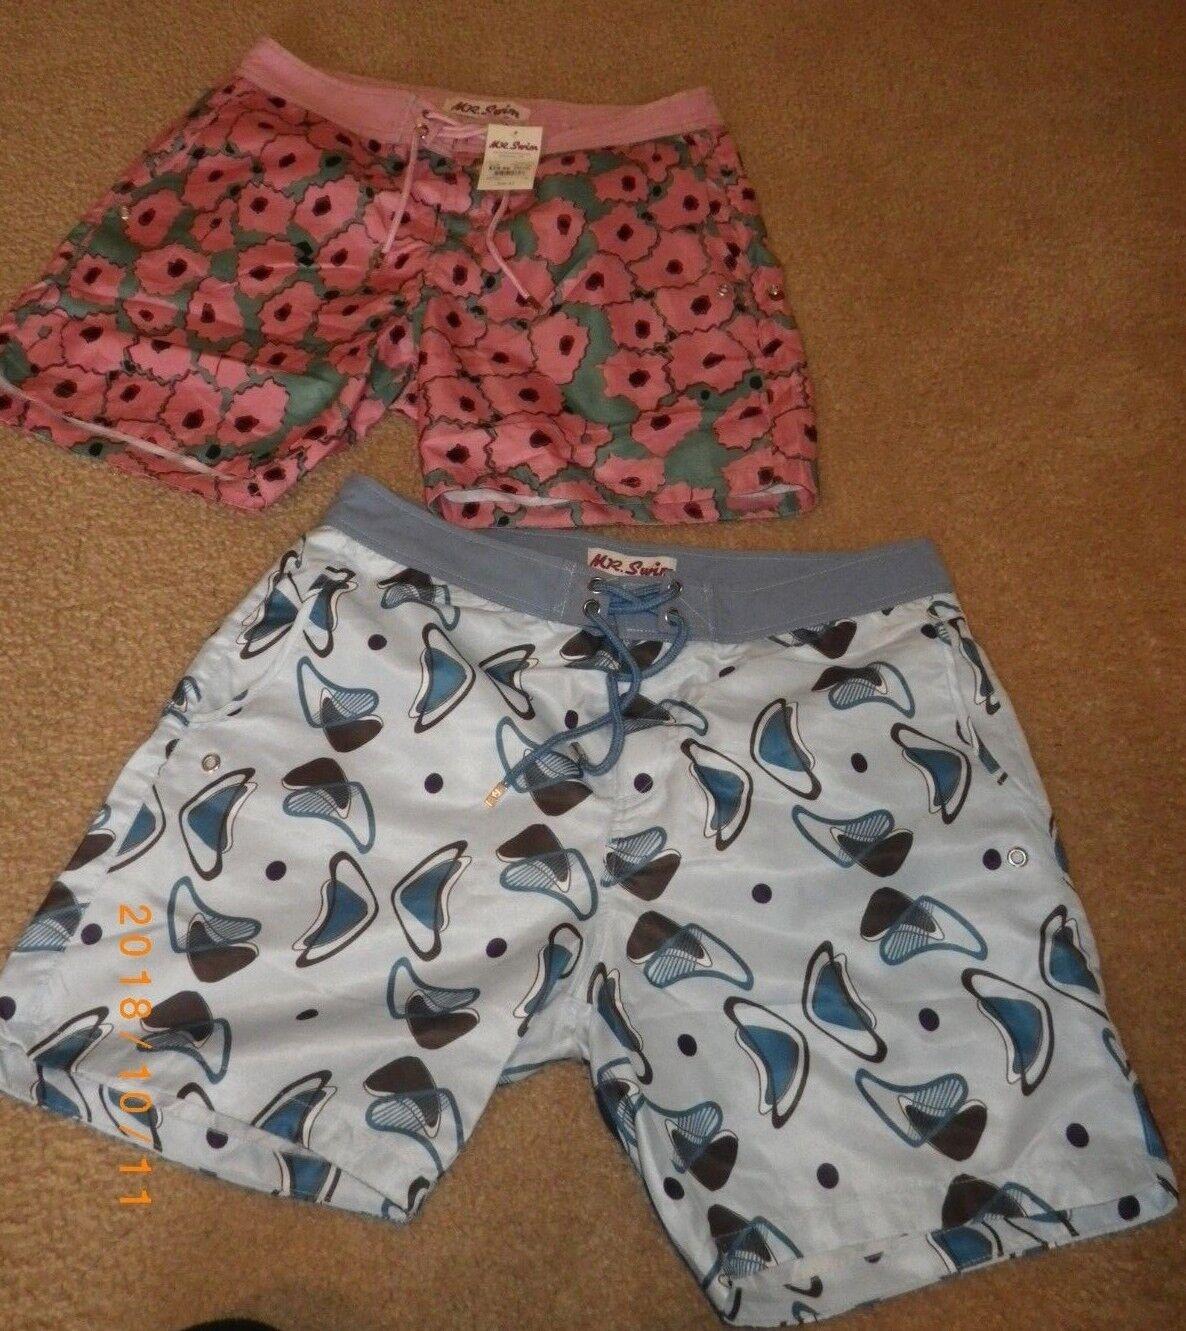 Lot of 2 Pairs of Mens Mr. Swim Swim Trunks Size 32 New Swimming Shorts Pink Geo